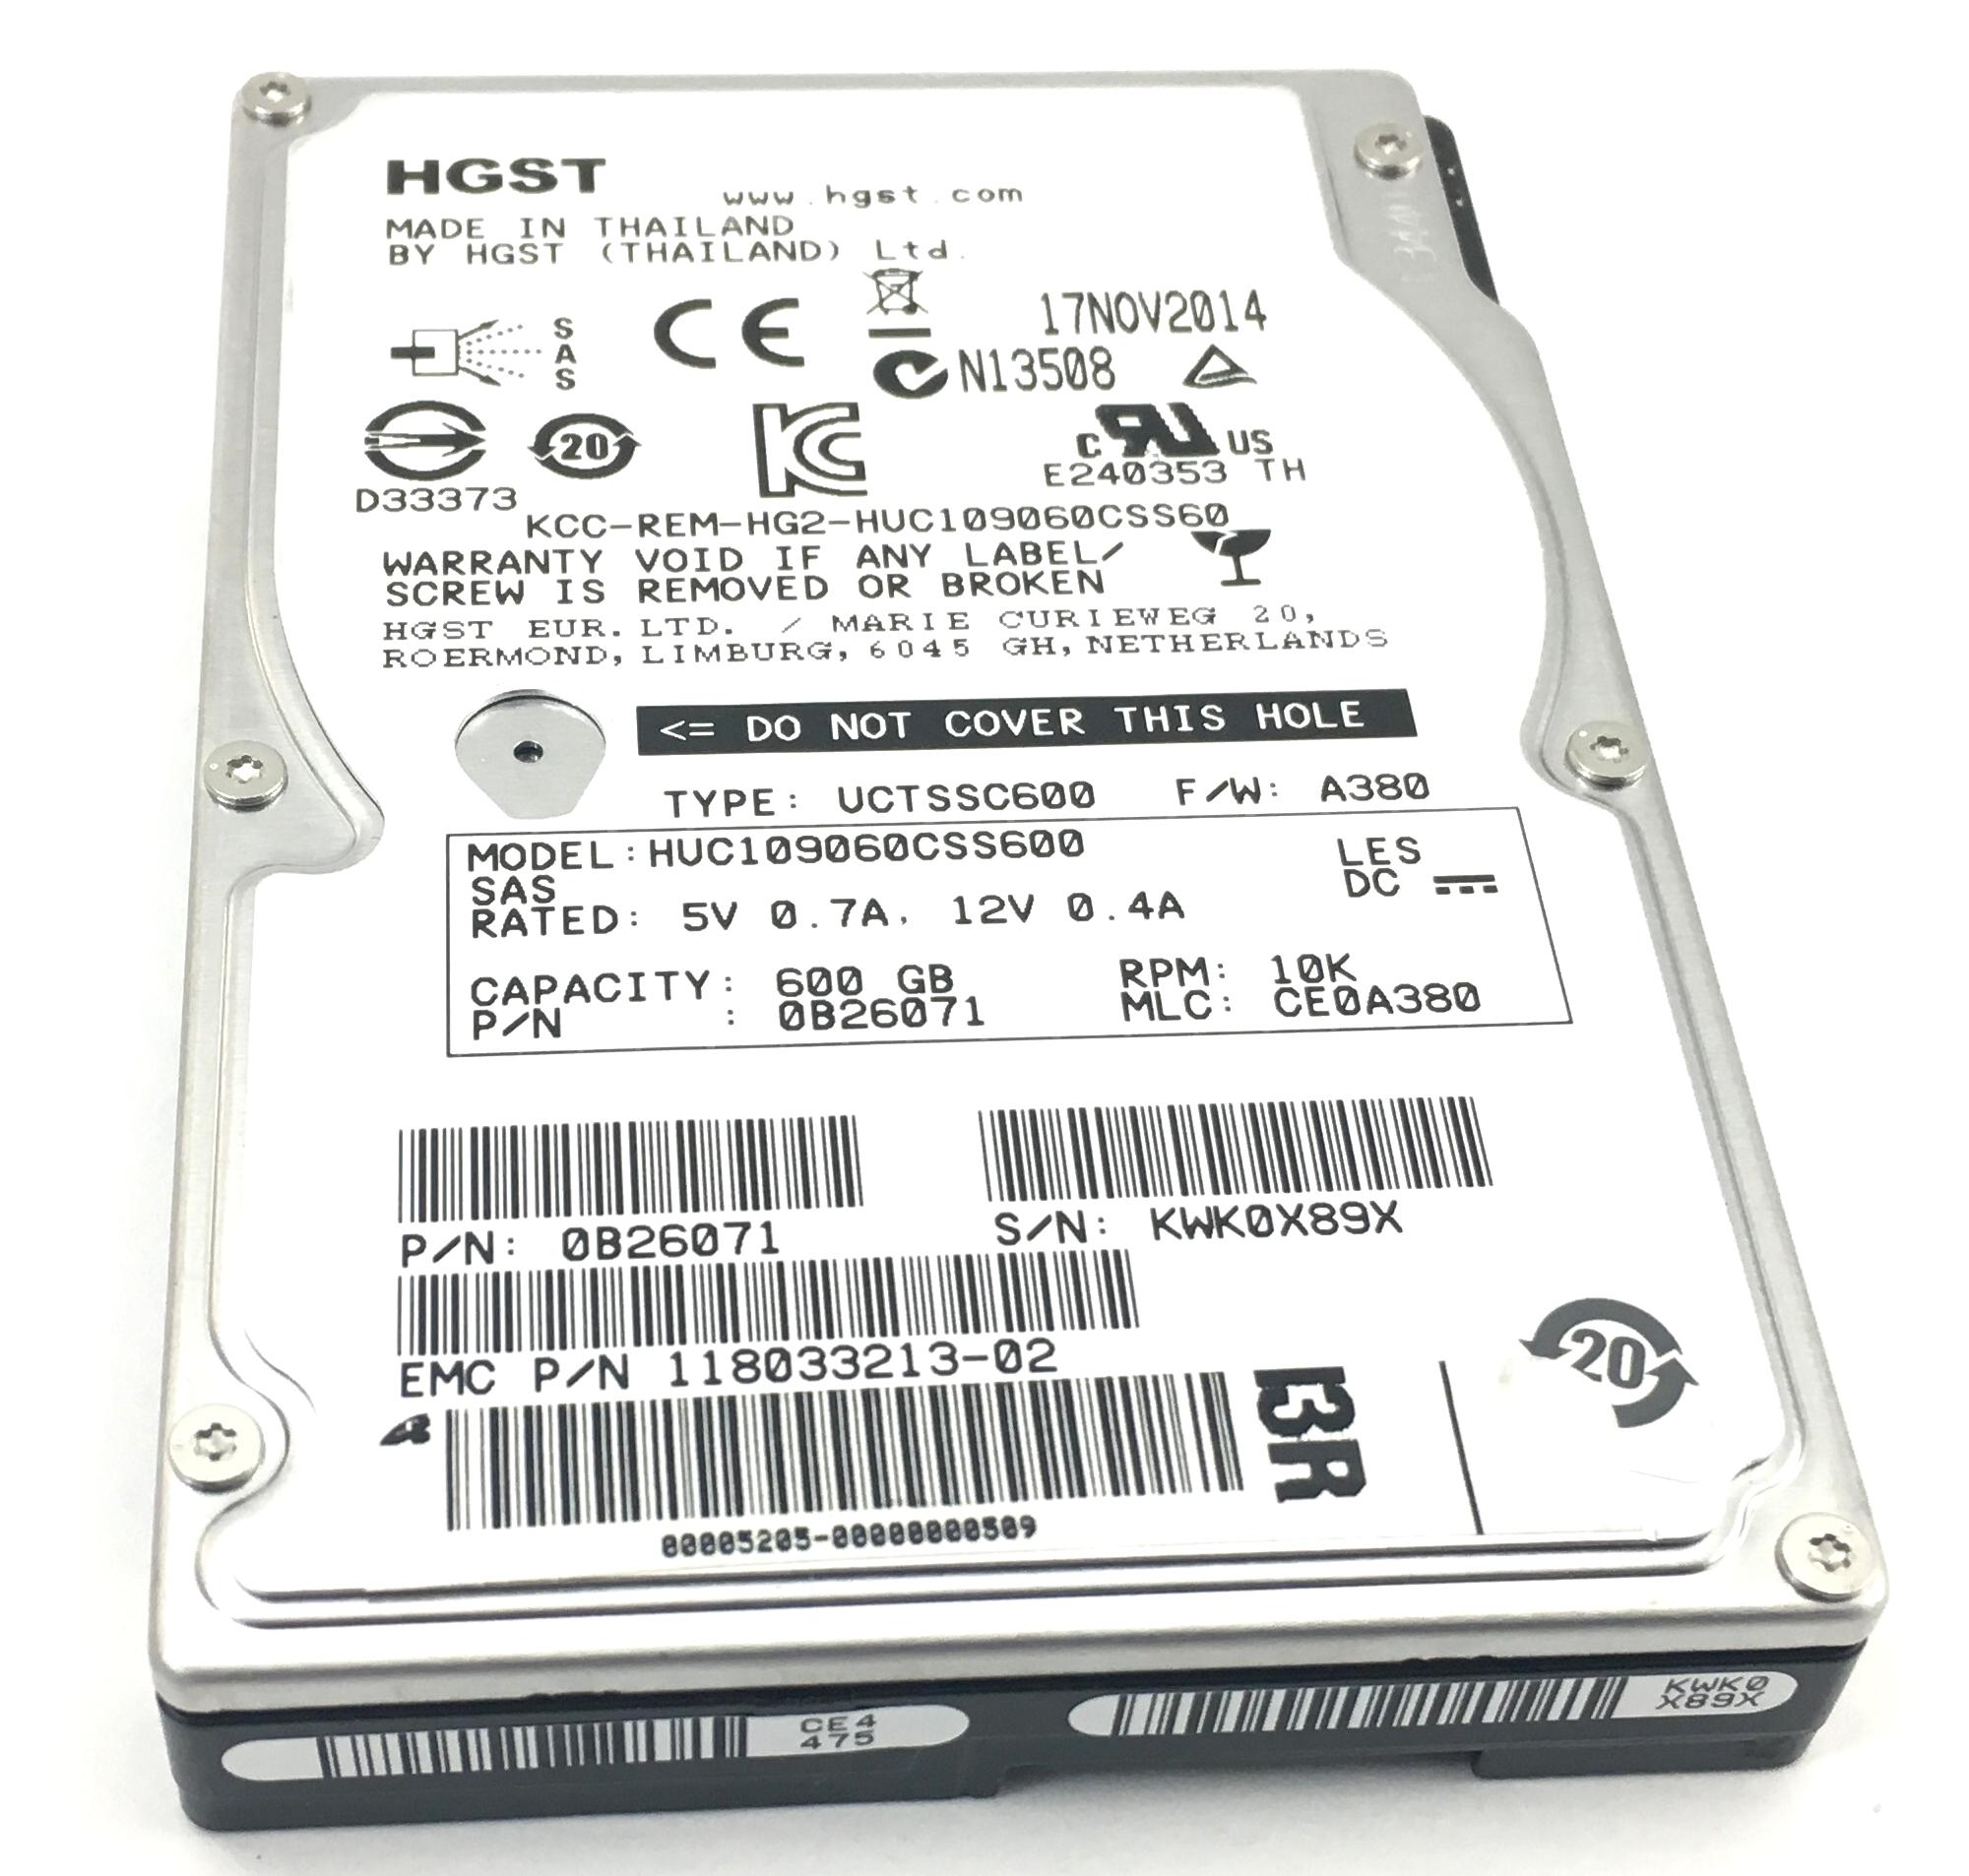 HGST 600GB 10K SAS 2.5'' HDD Hard Drive (HUC109060CSS600)